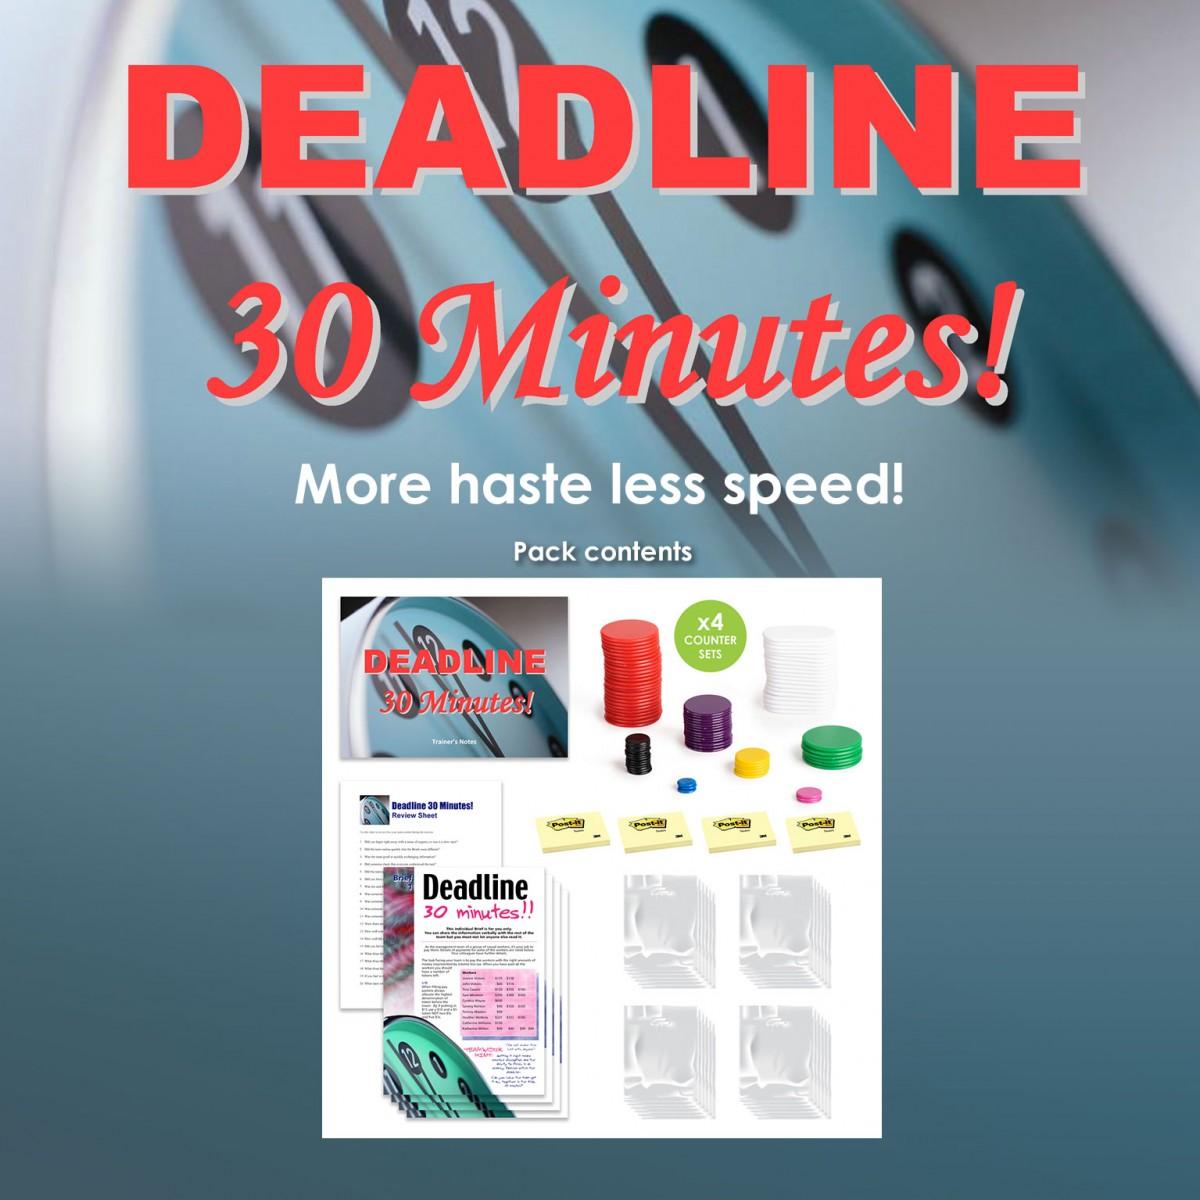 Deadline 30 minutes